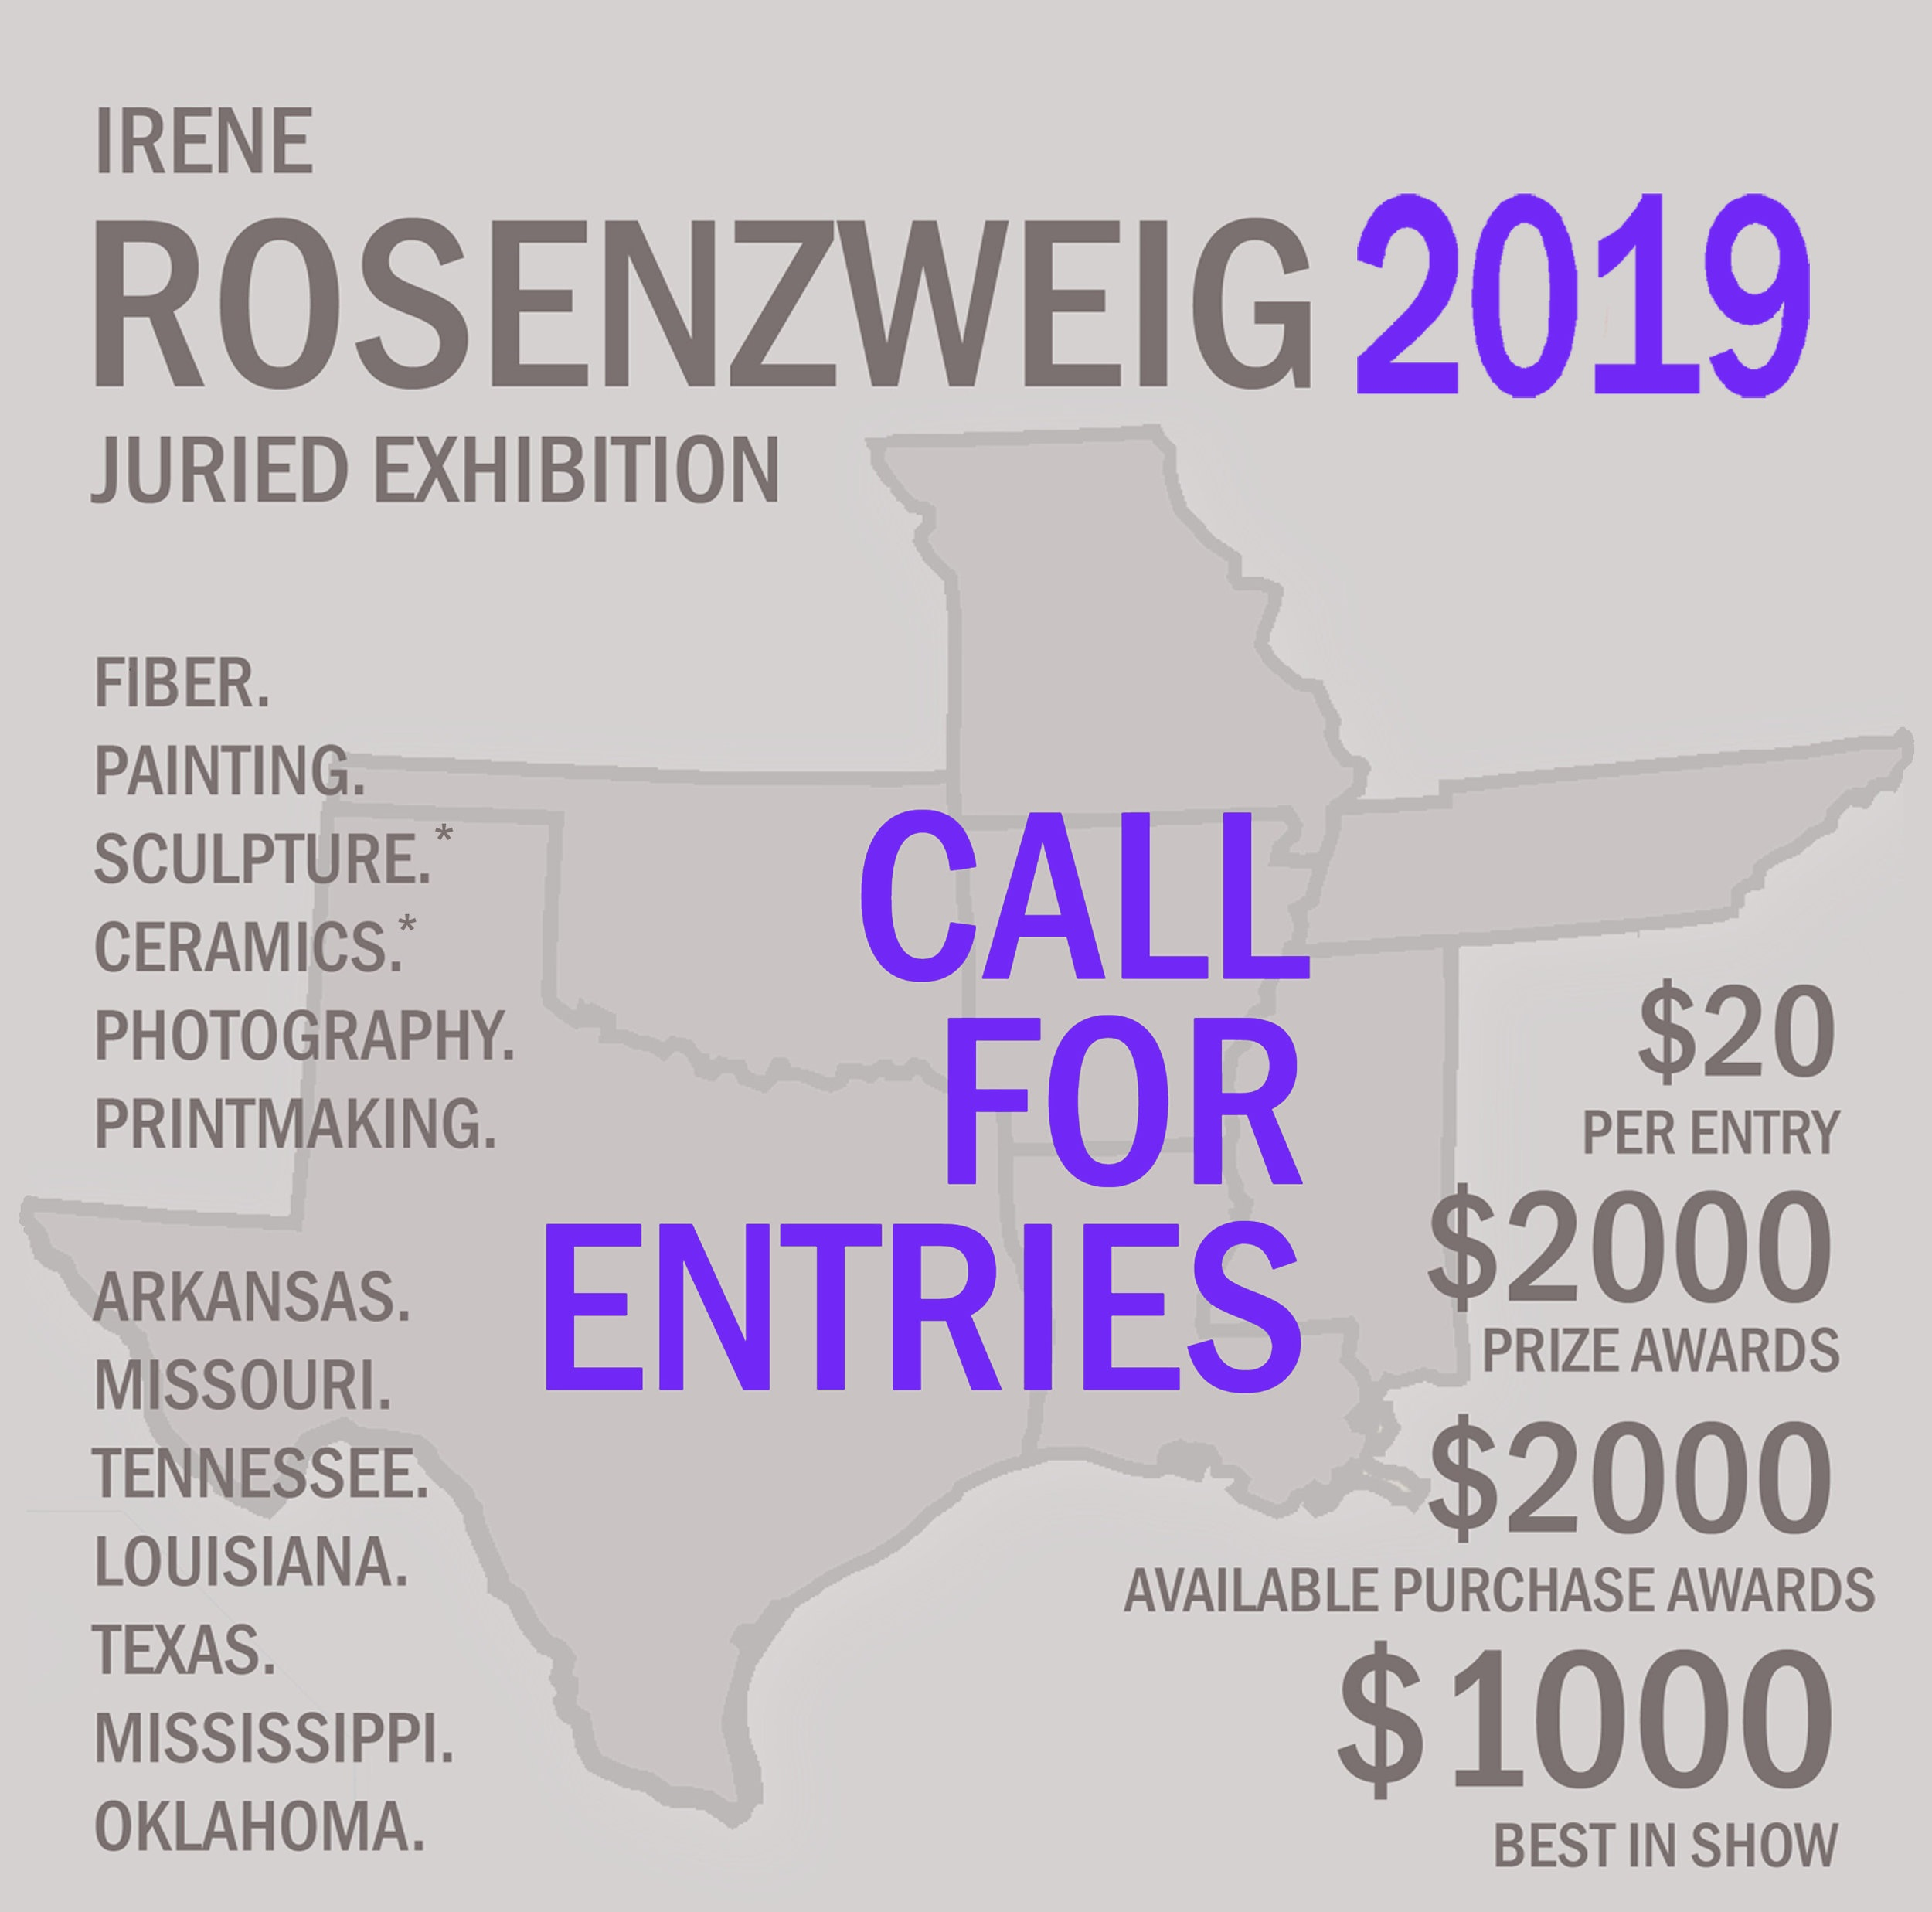 Rosenzweig+2019+CALL+FOR+ENTRIES.jpg